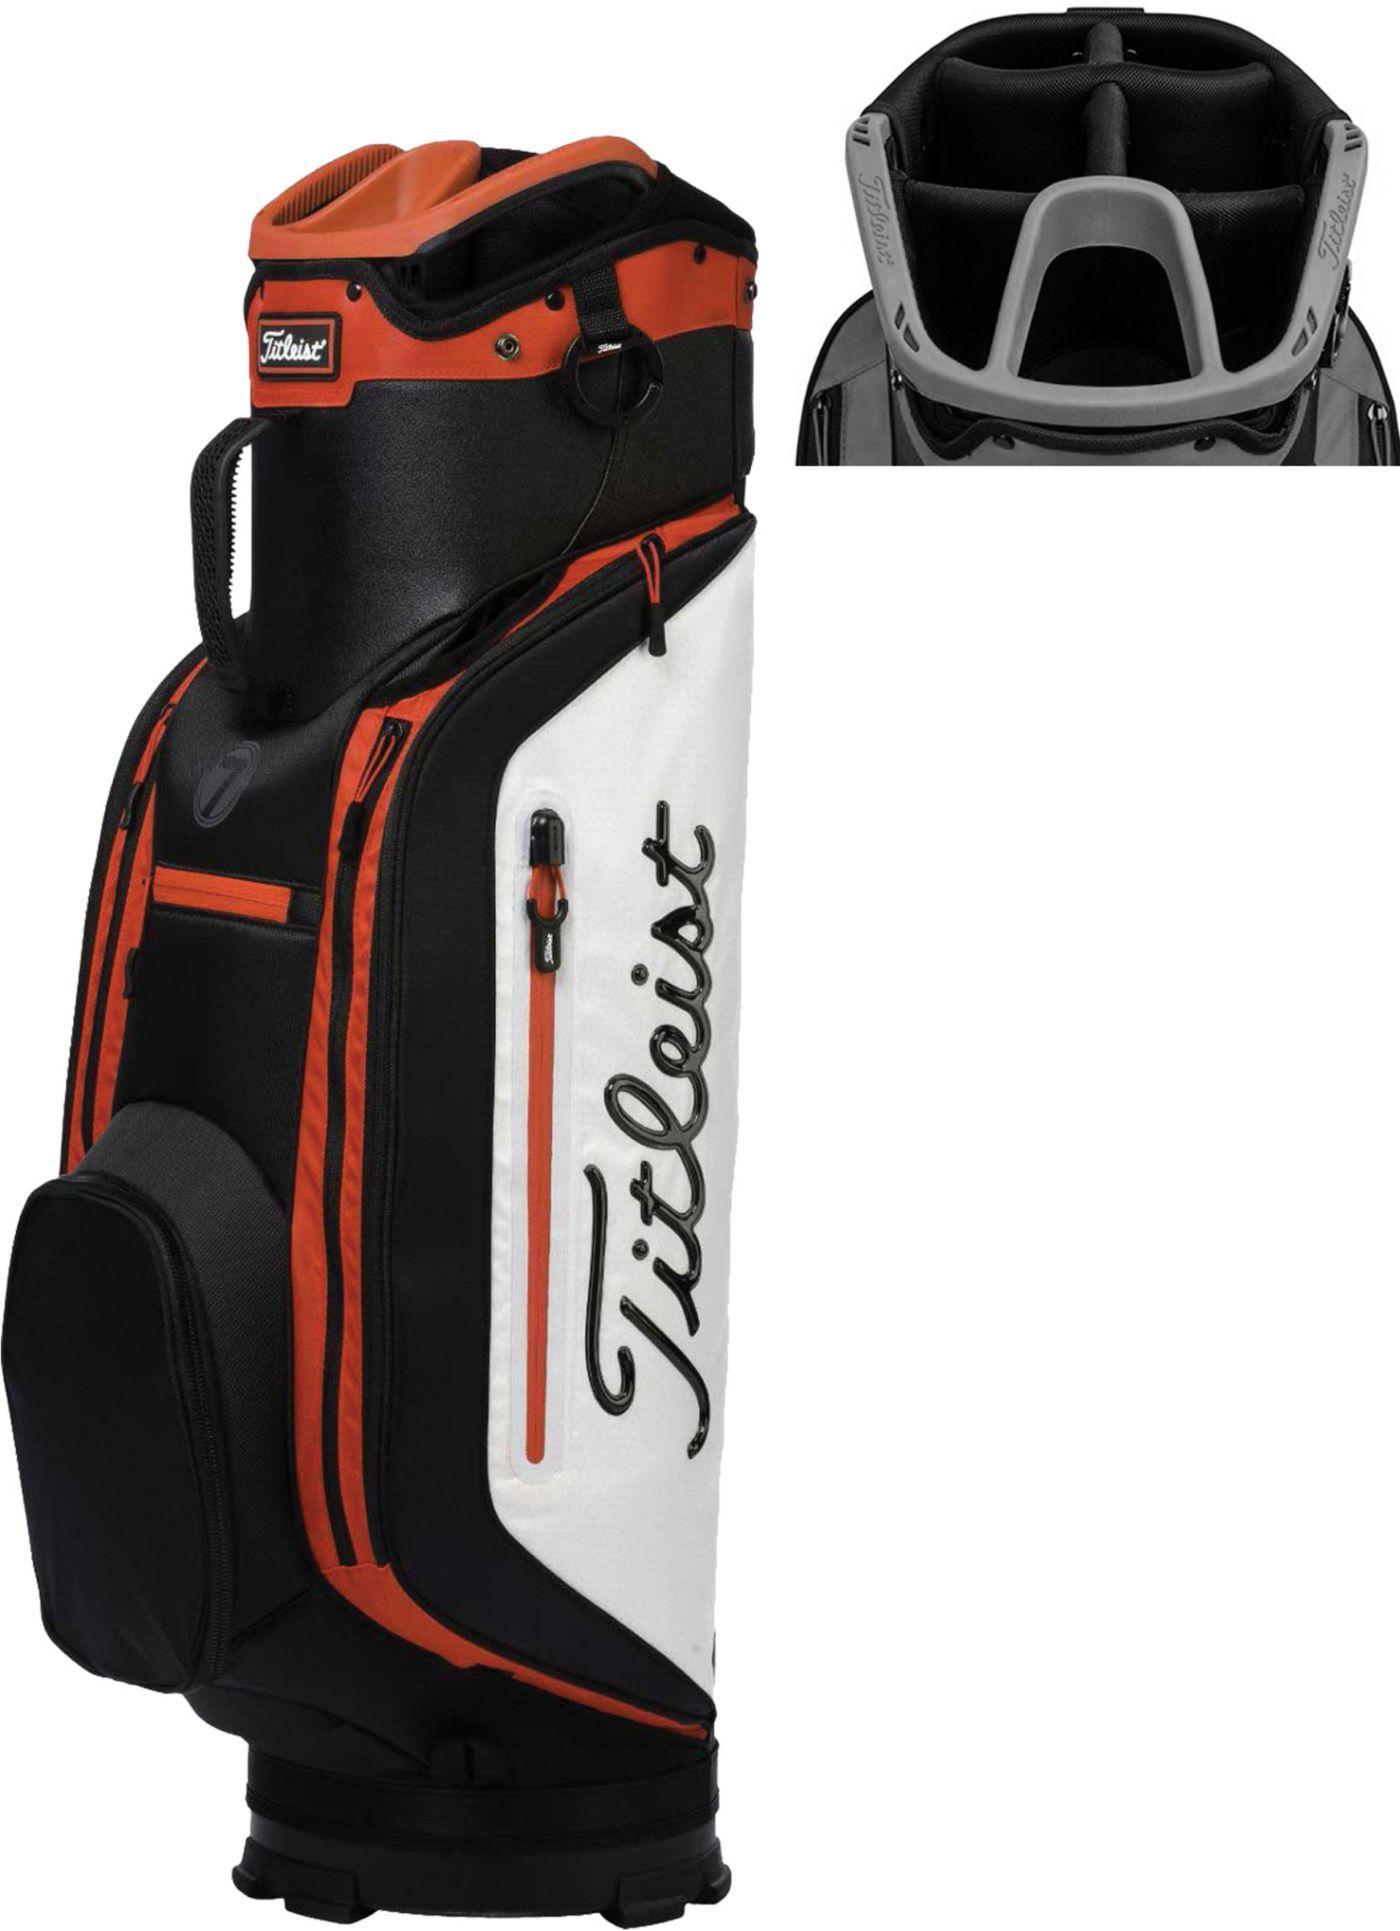 Titleist 2018 Club 7 Cart Bag